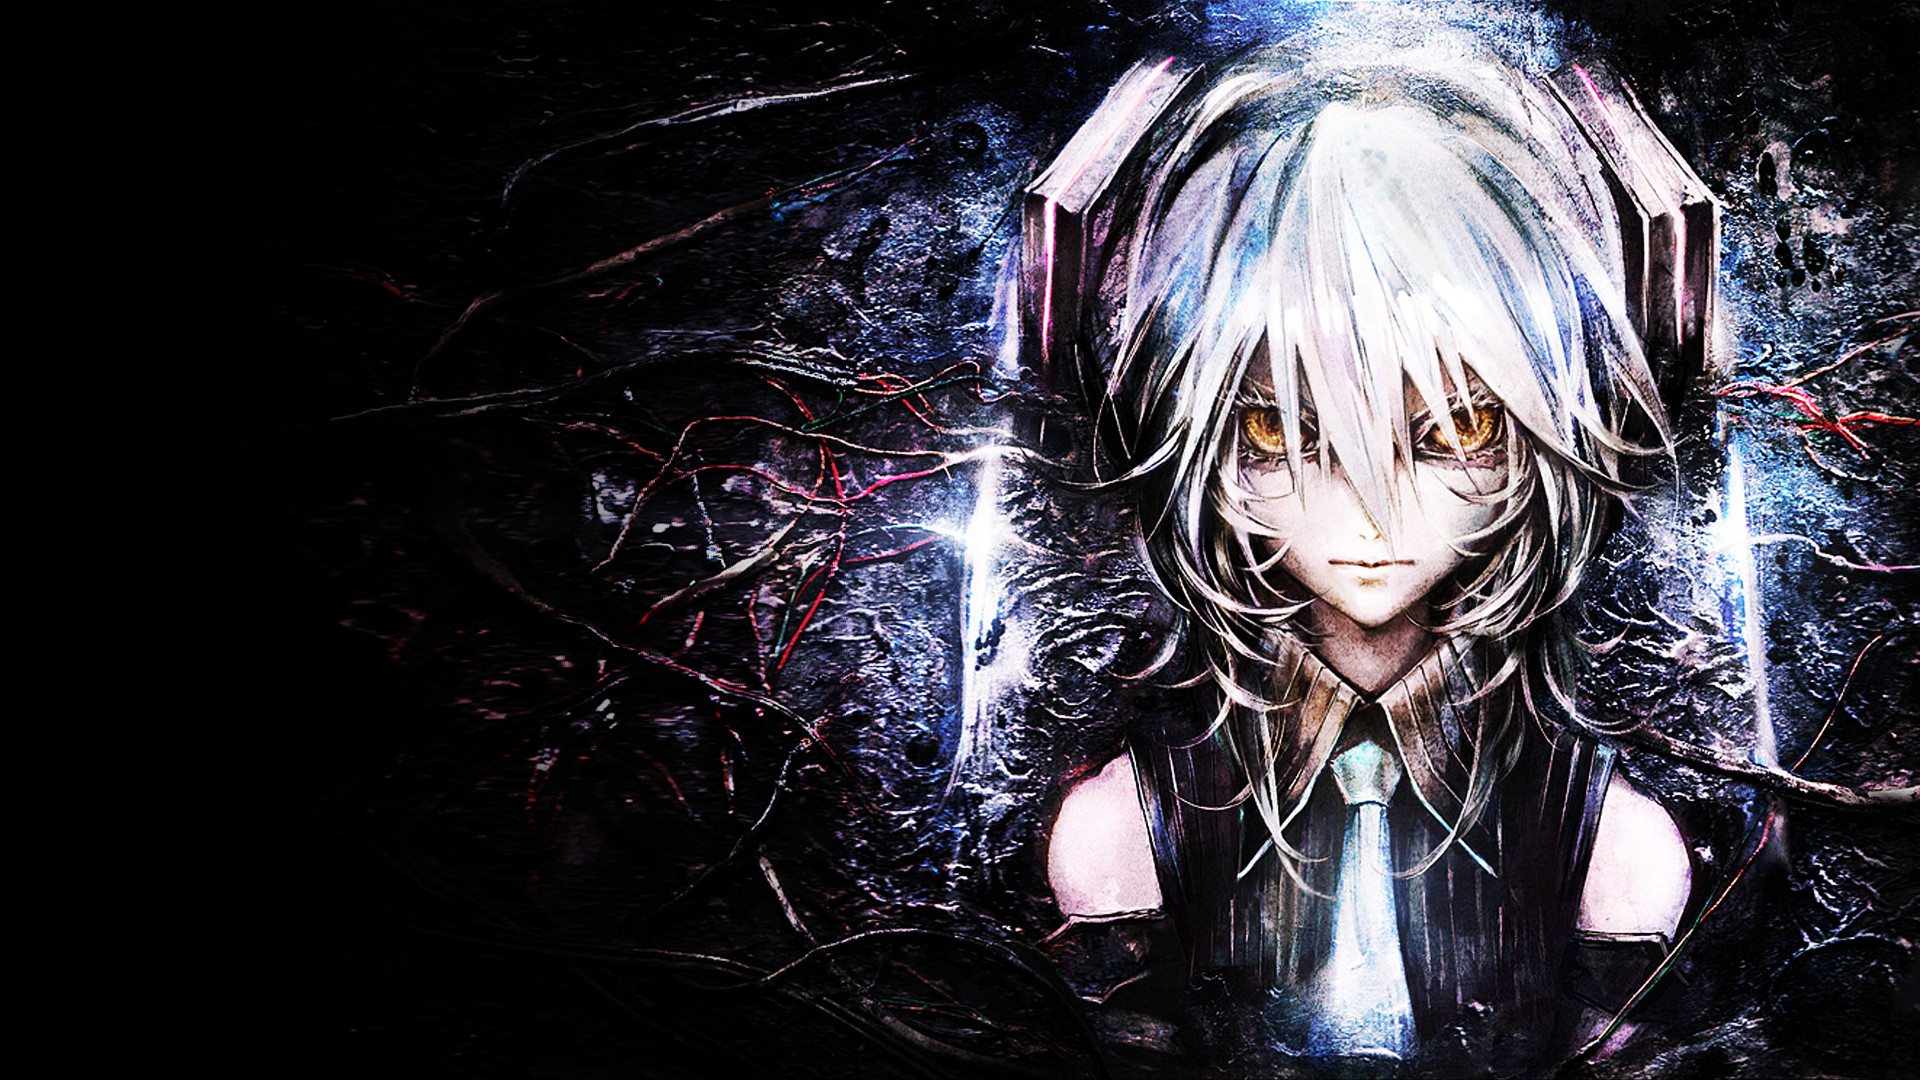 Cool Anime Wallpapers Hd Download Download 'cool anime hd desktop image' HD  wallpaper